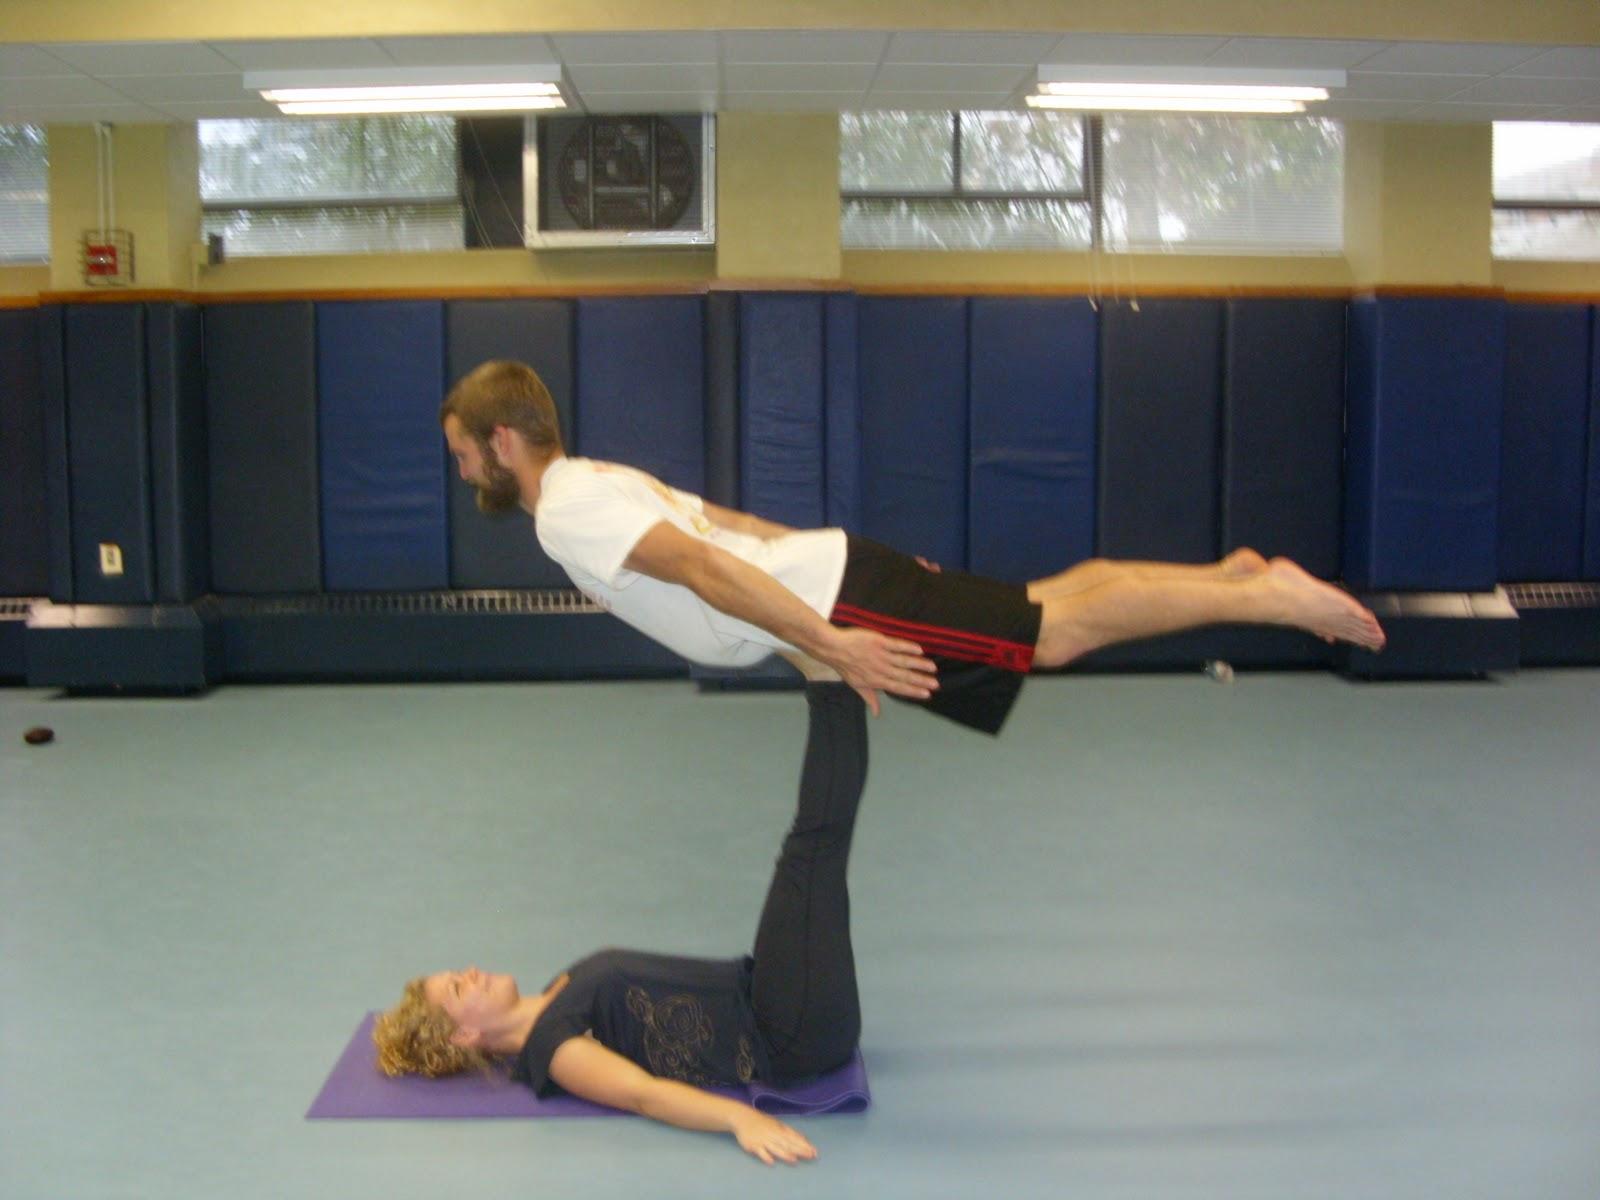 Life Love and Yoga: Acro Yoga Club At New Paltz